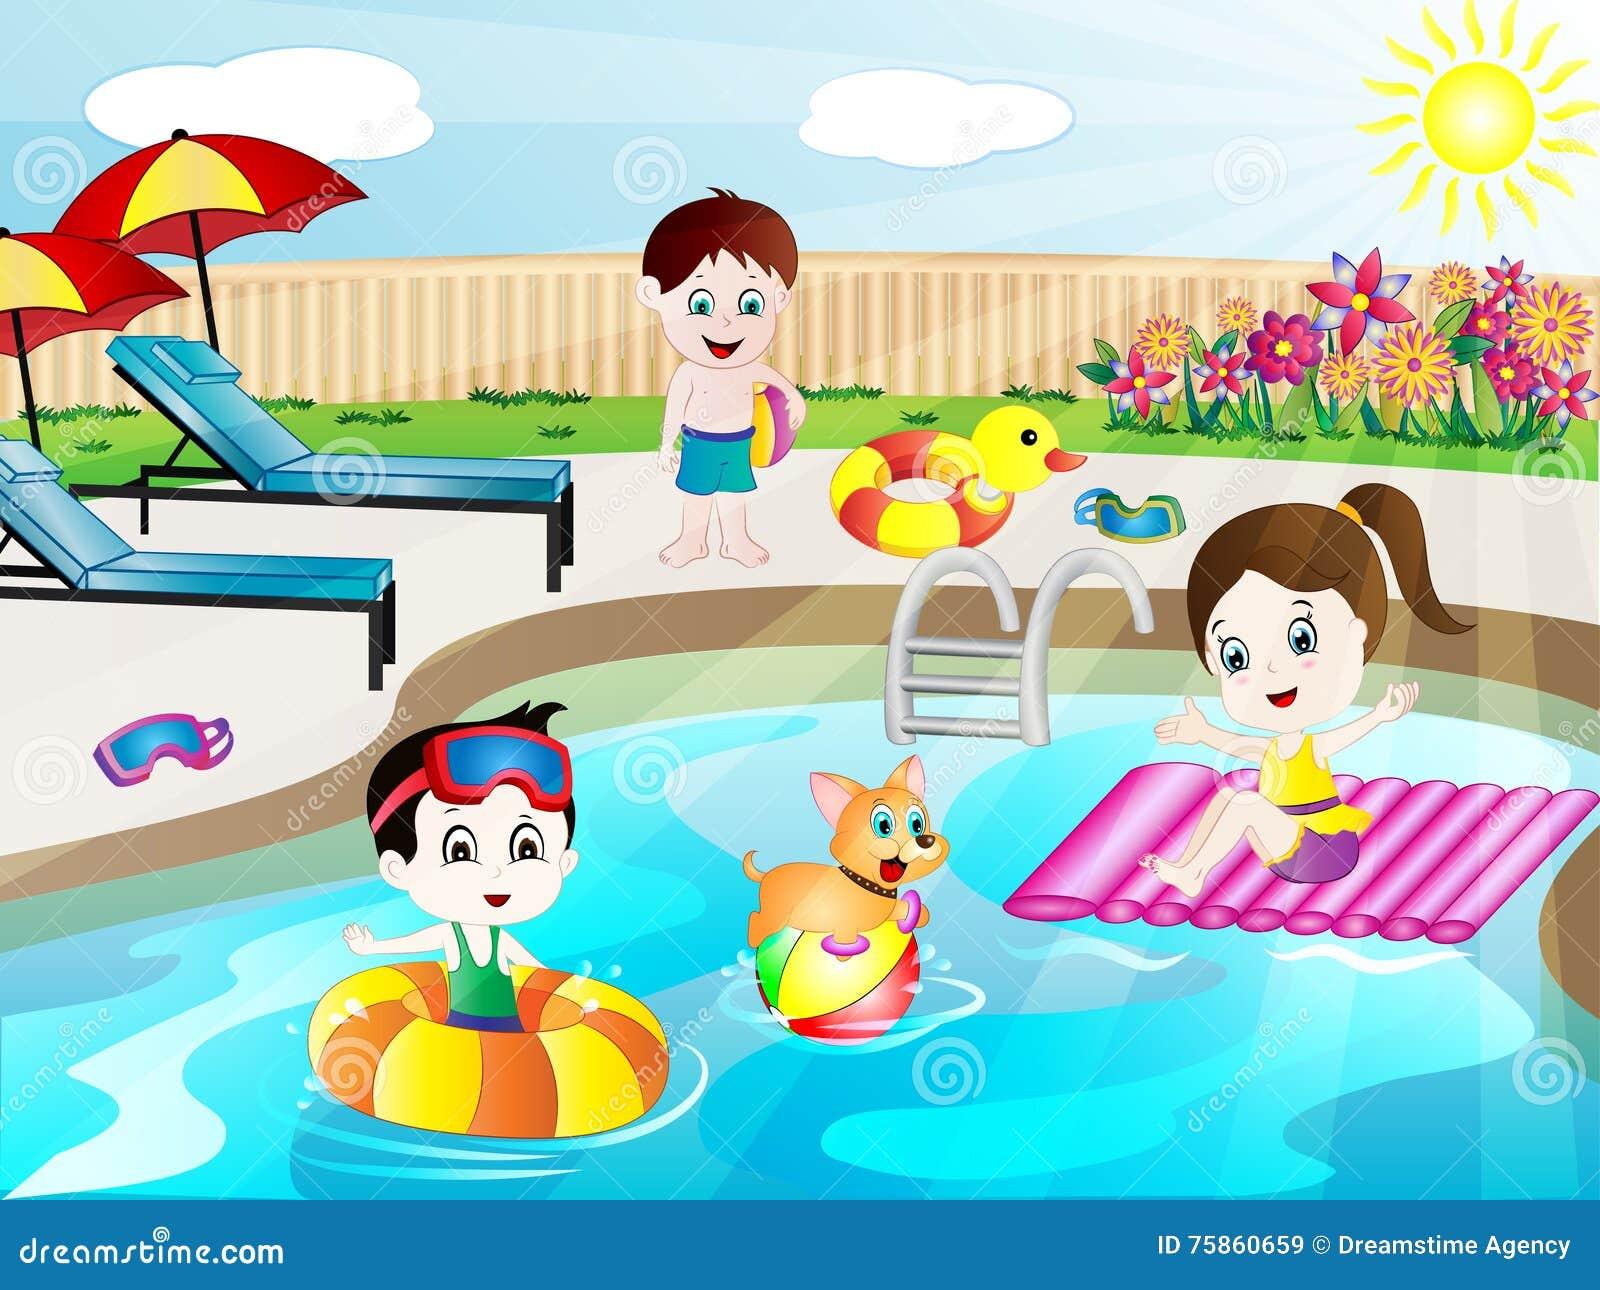 Kids swimming clipart  Swimming Stock Illustrations – 43,982 Swimming Stock Illustrations ...